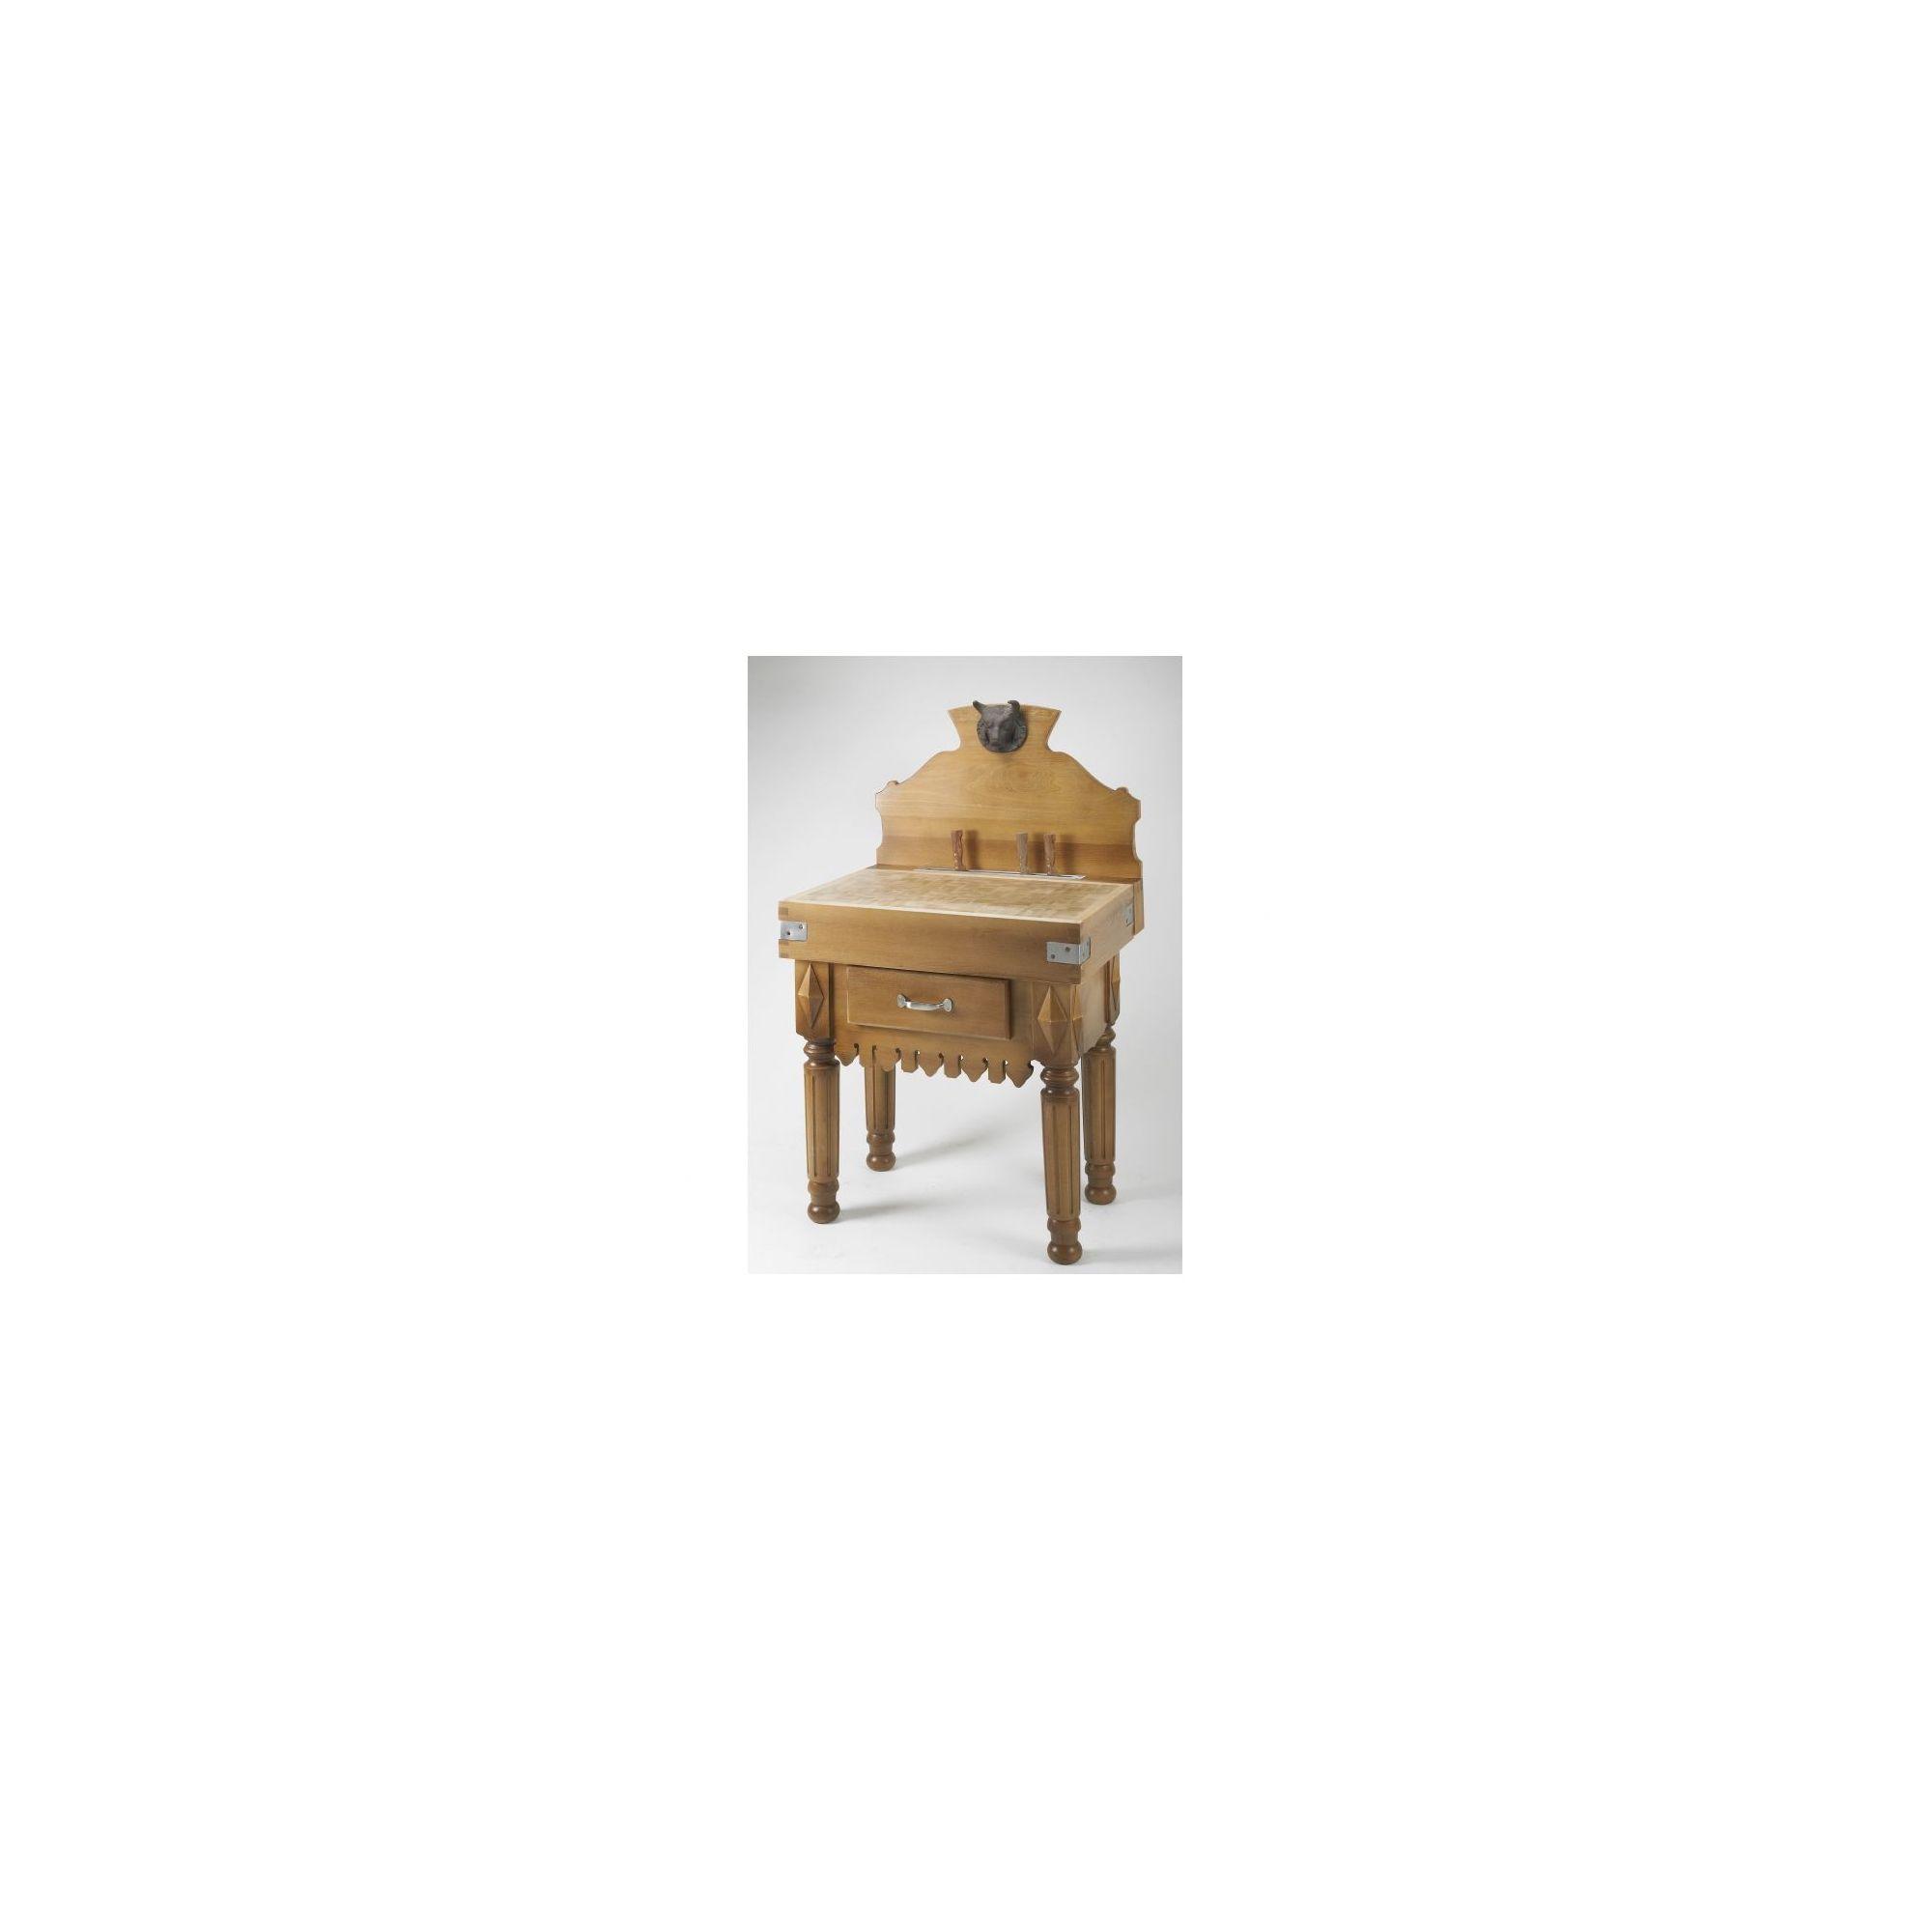 Chabret Antique Block - 135cm X 80cm X 60cm at Tesco Direct